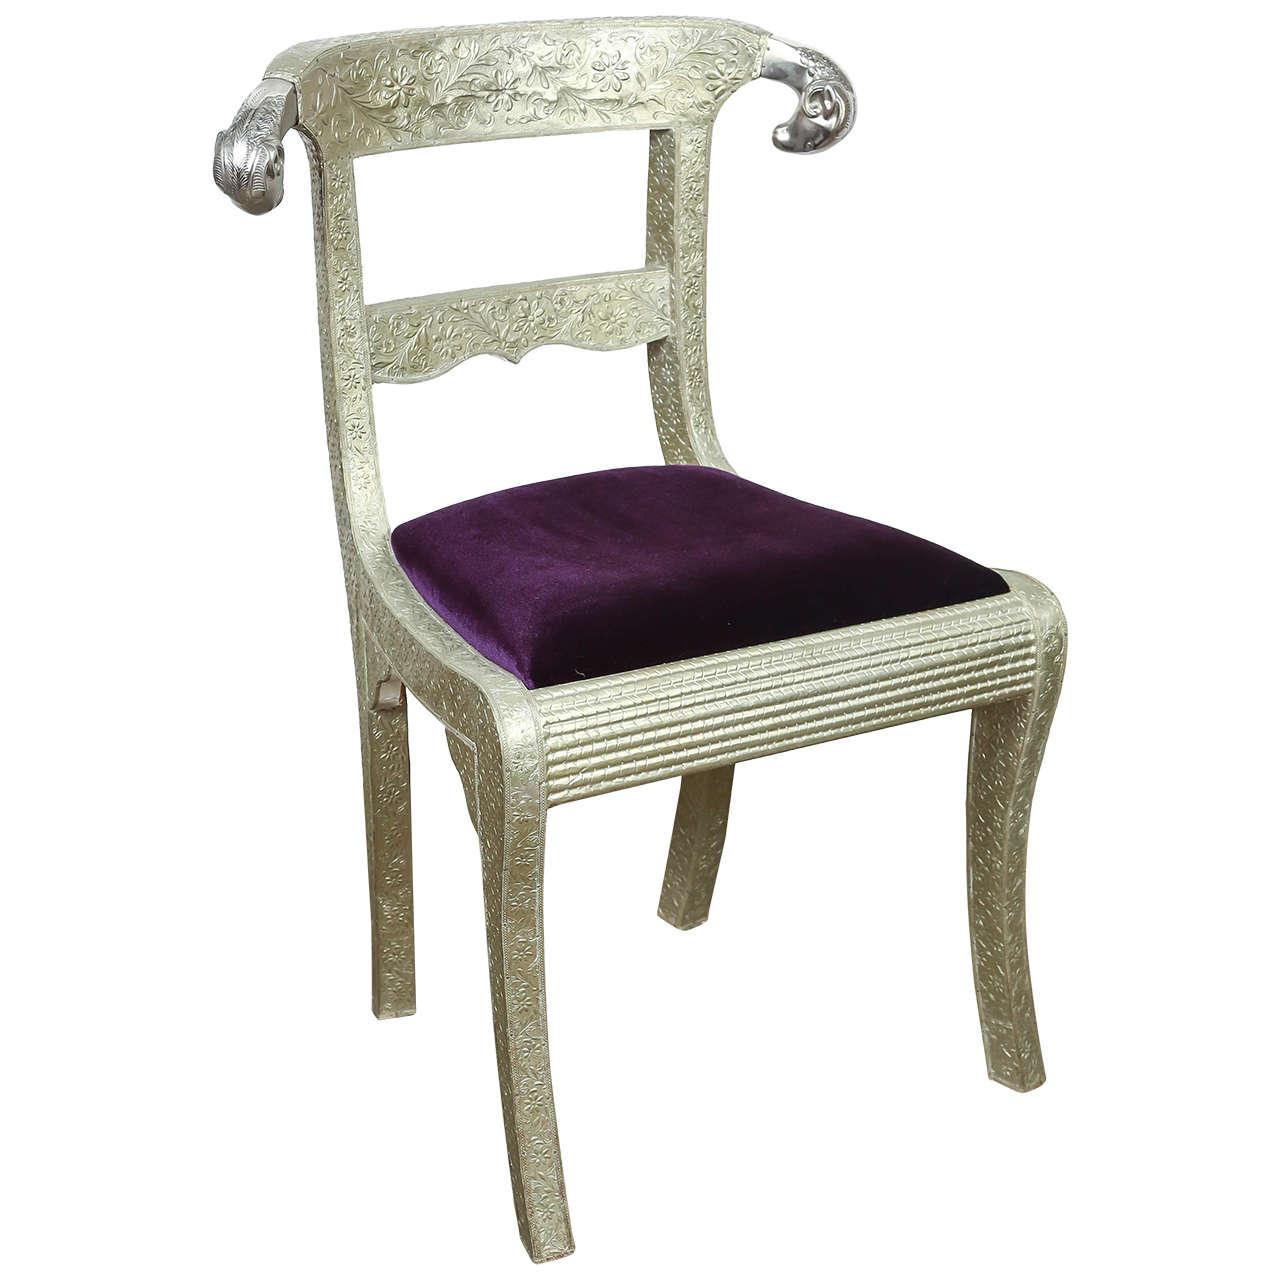 Anglo raj wedding side chair for sale at 1stdibs for Side chairs for sale